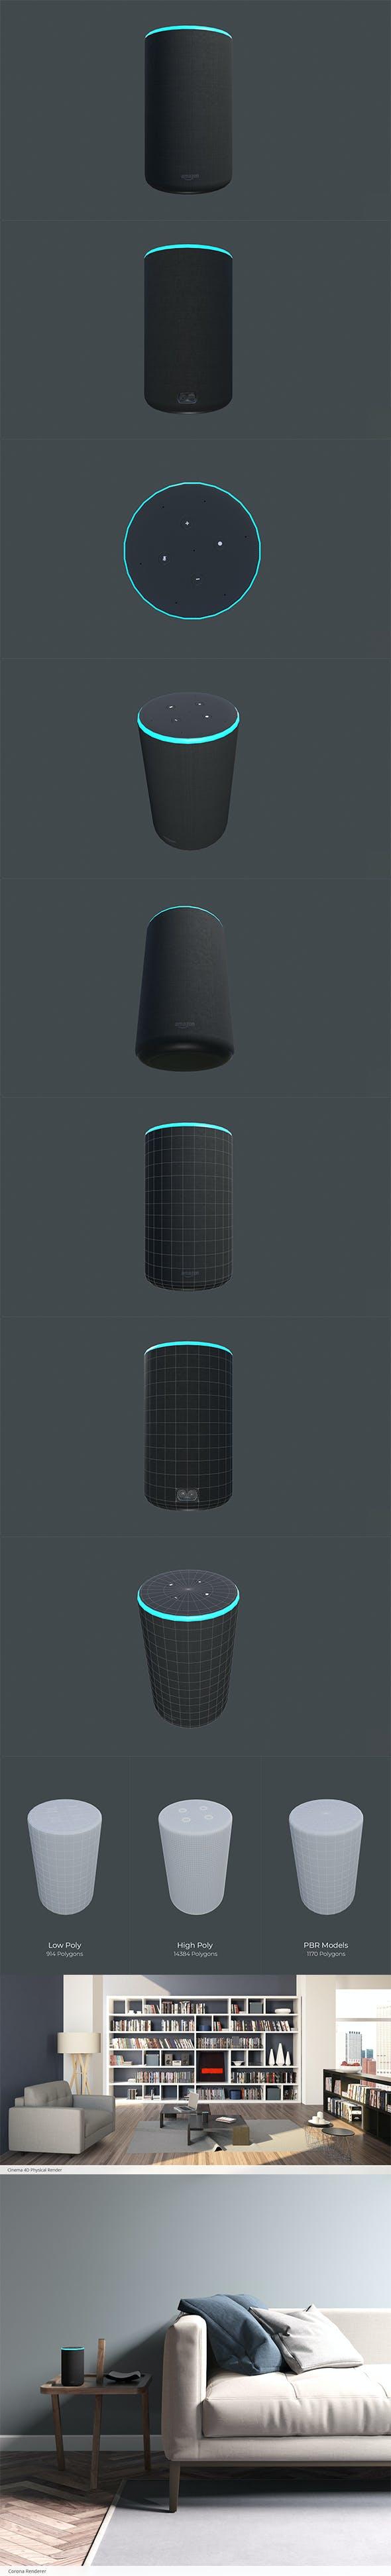 Smart Speake Amazon Echo - 3DOcean Item for Sale